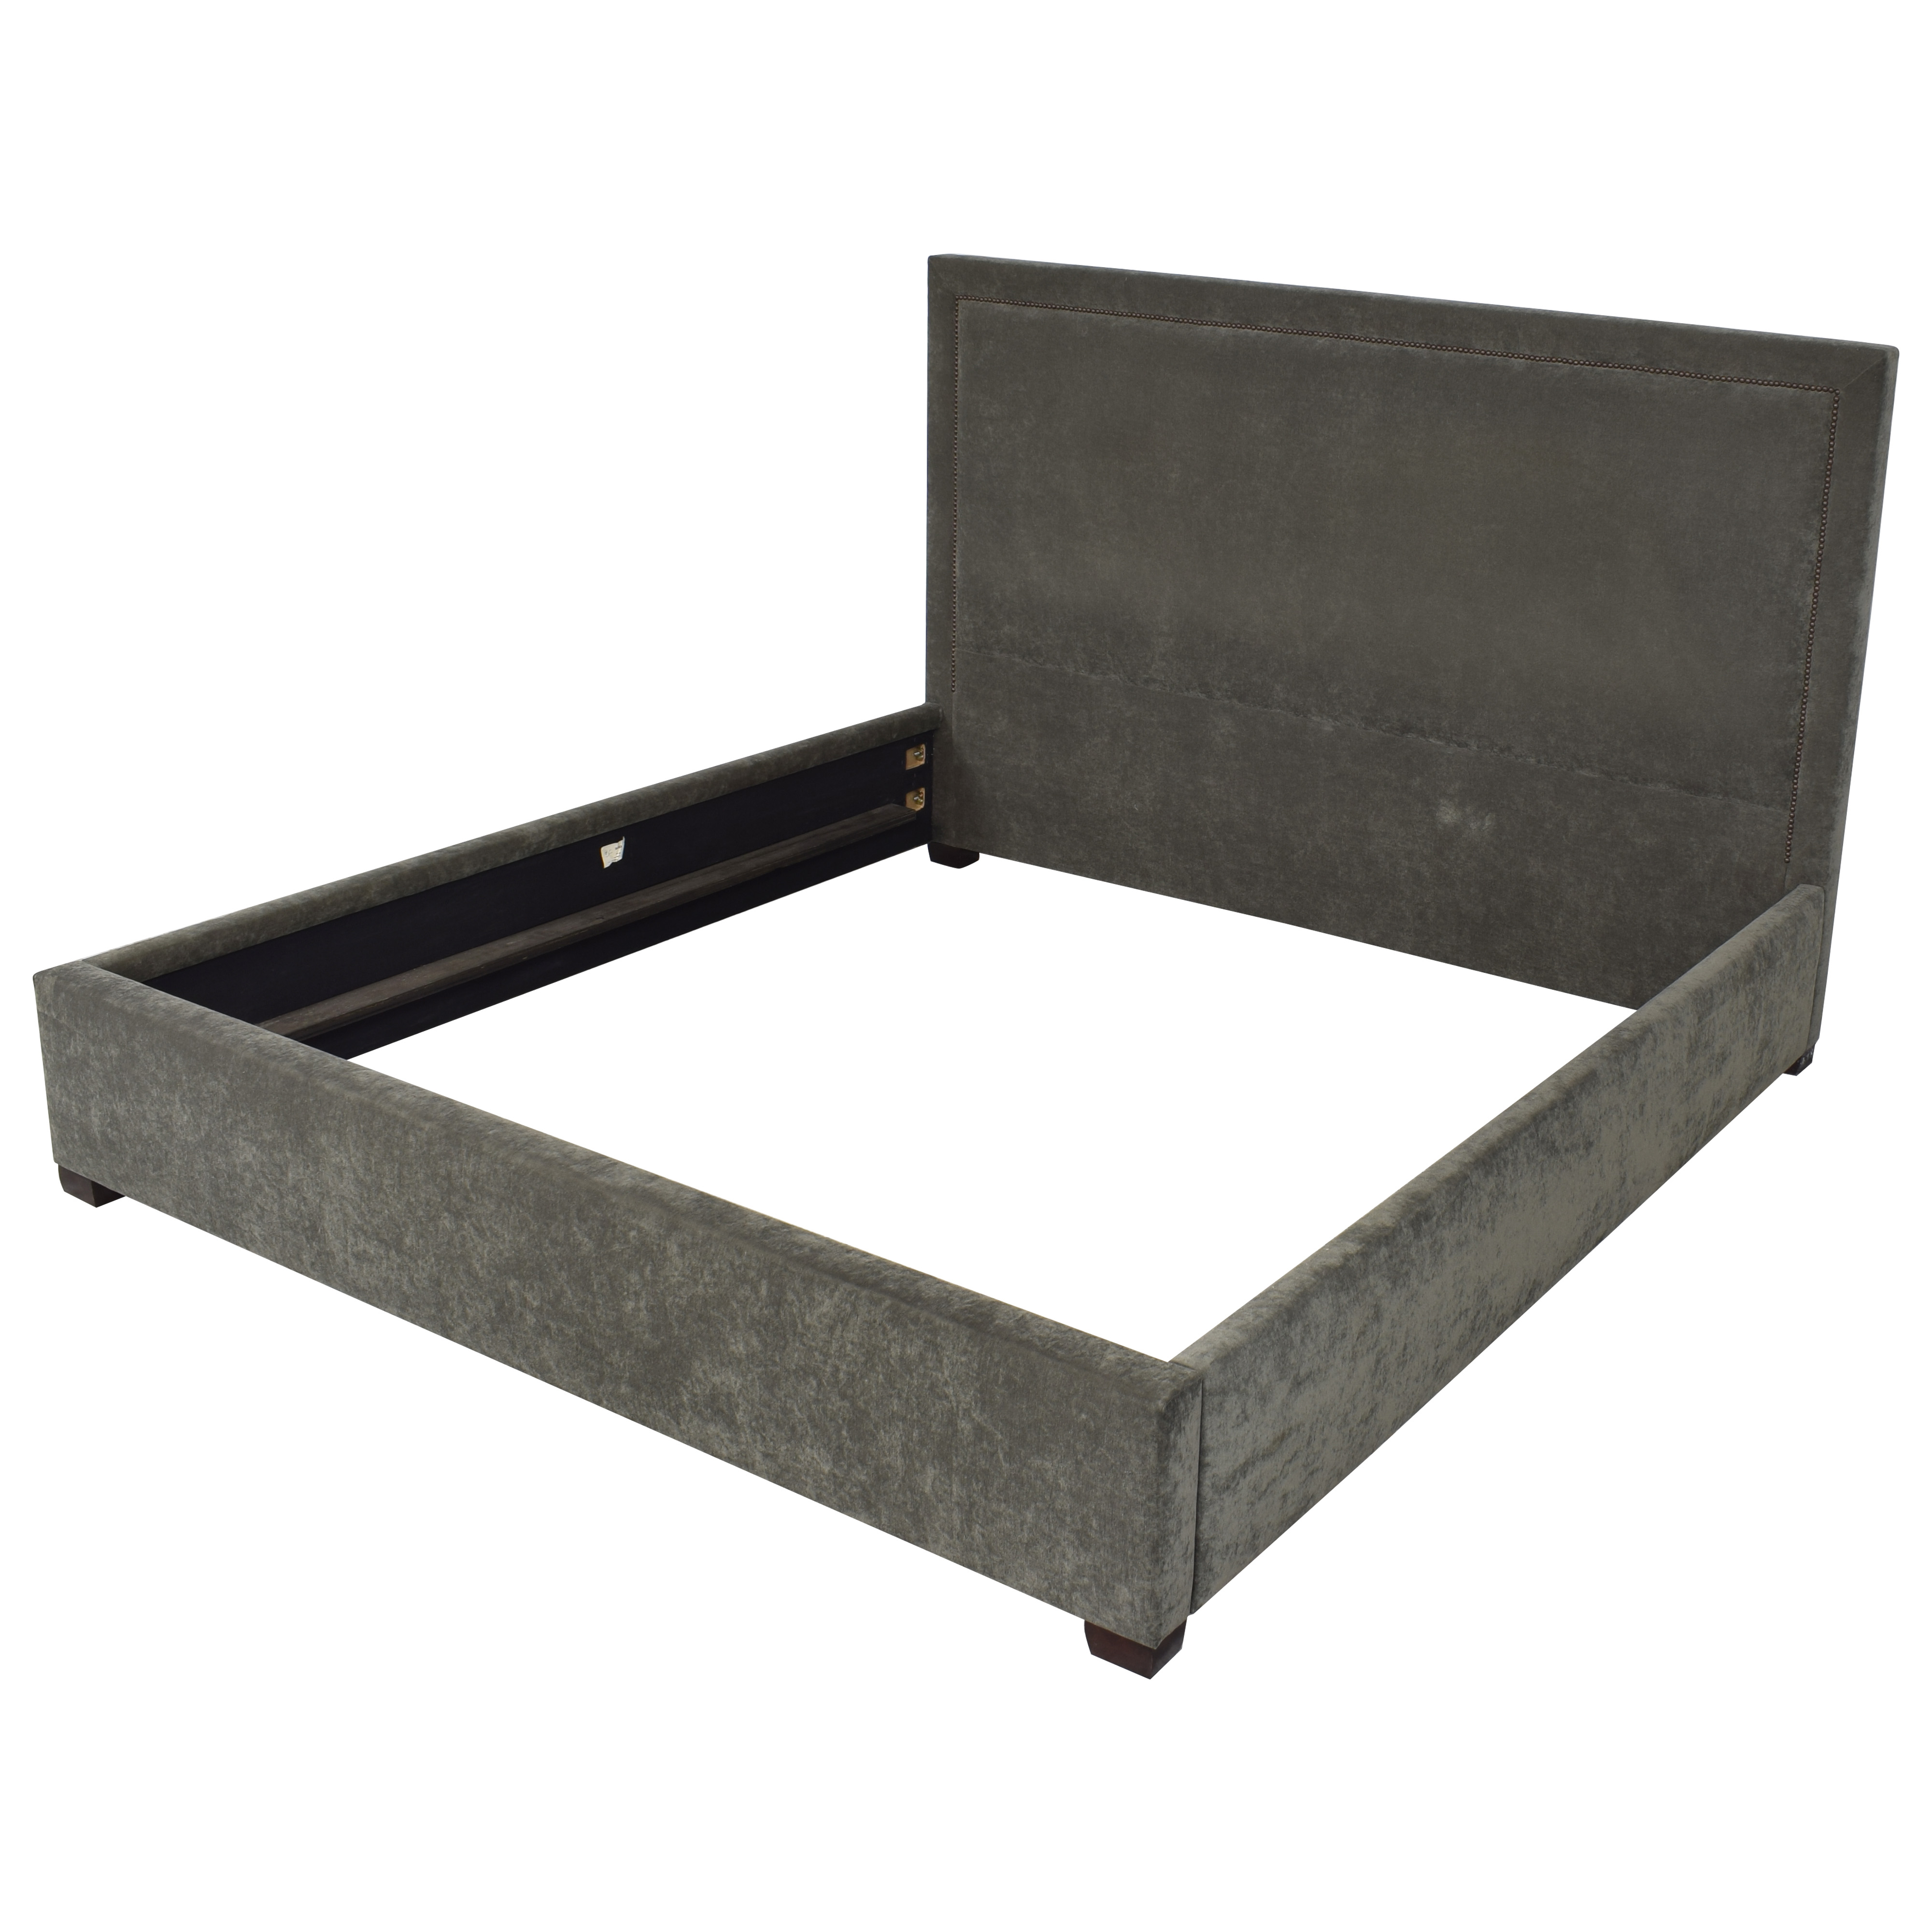 Bernhardt Bernhardt Morgan King Bed on sale